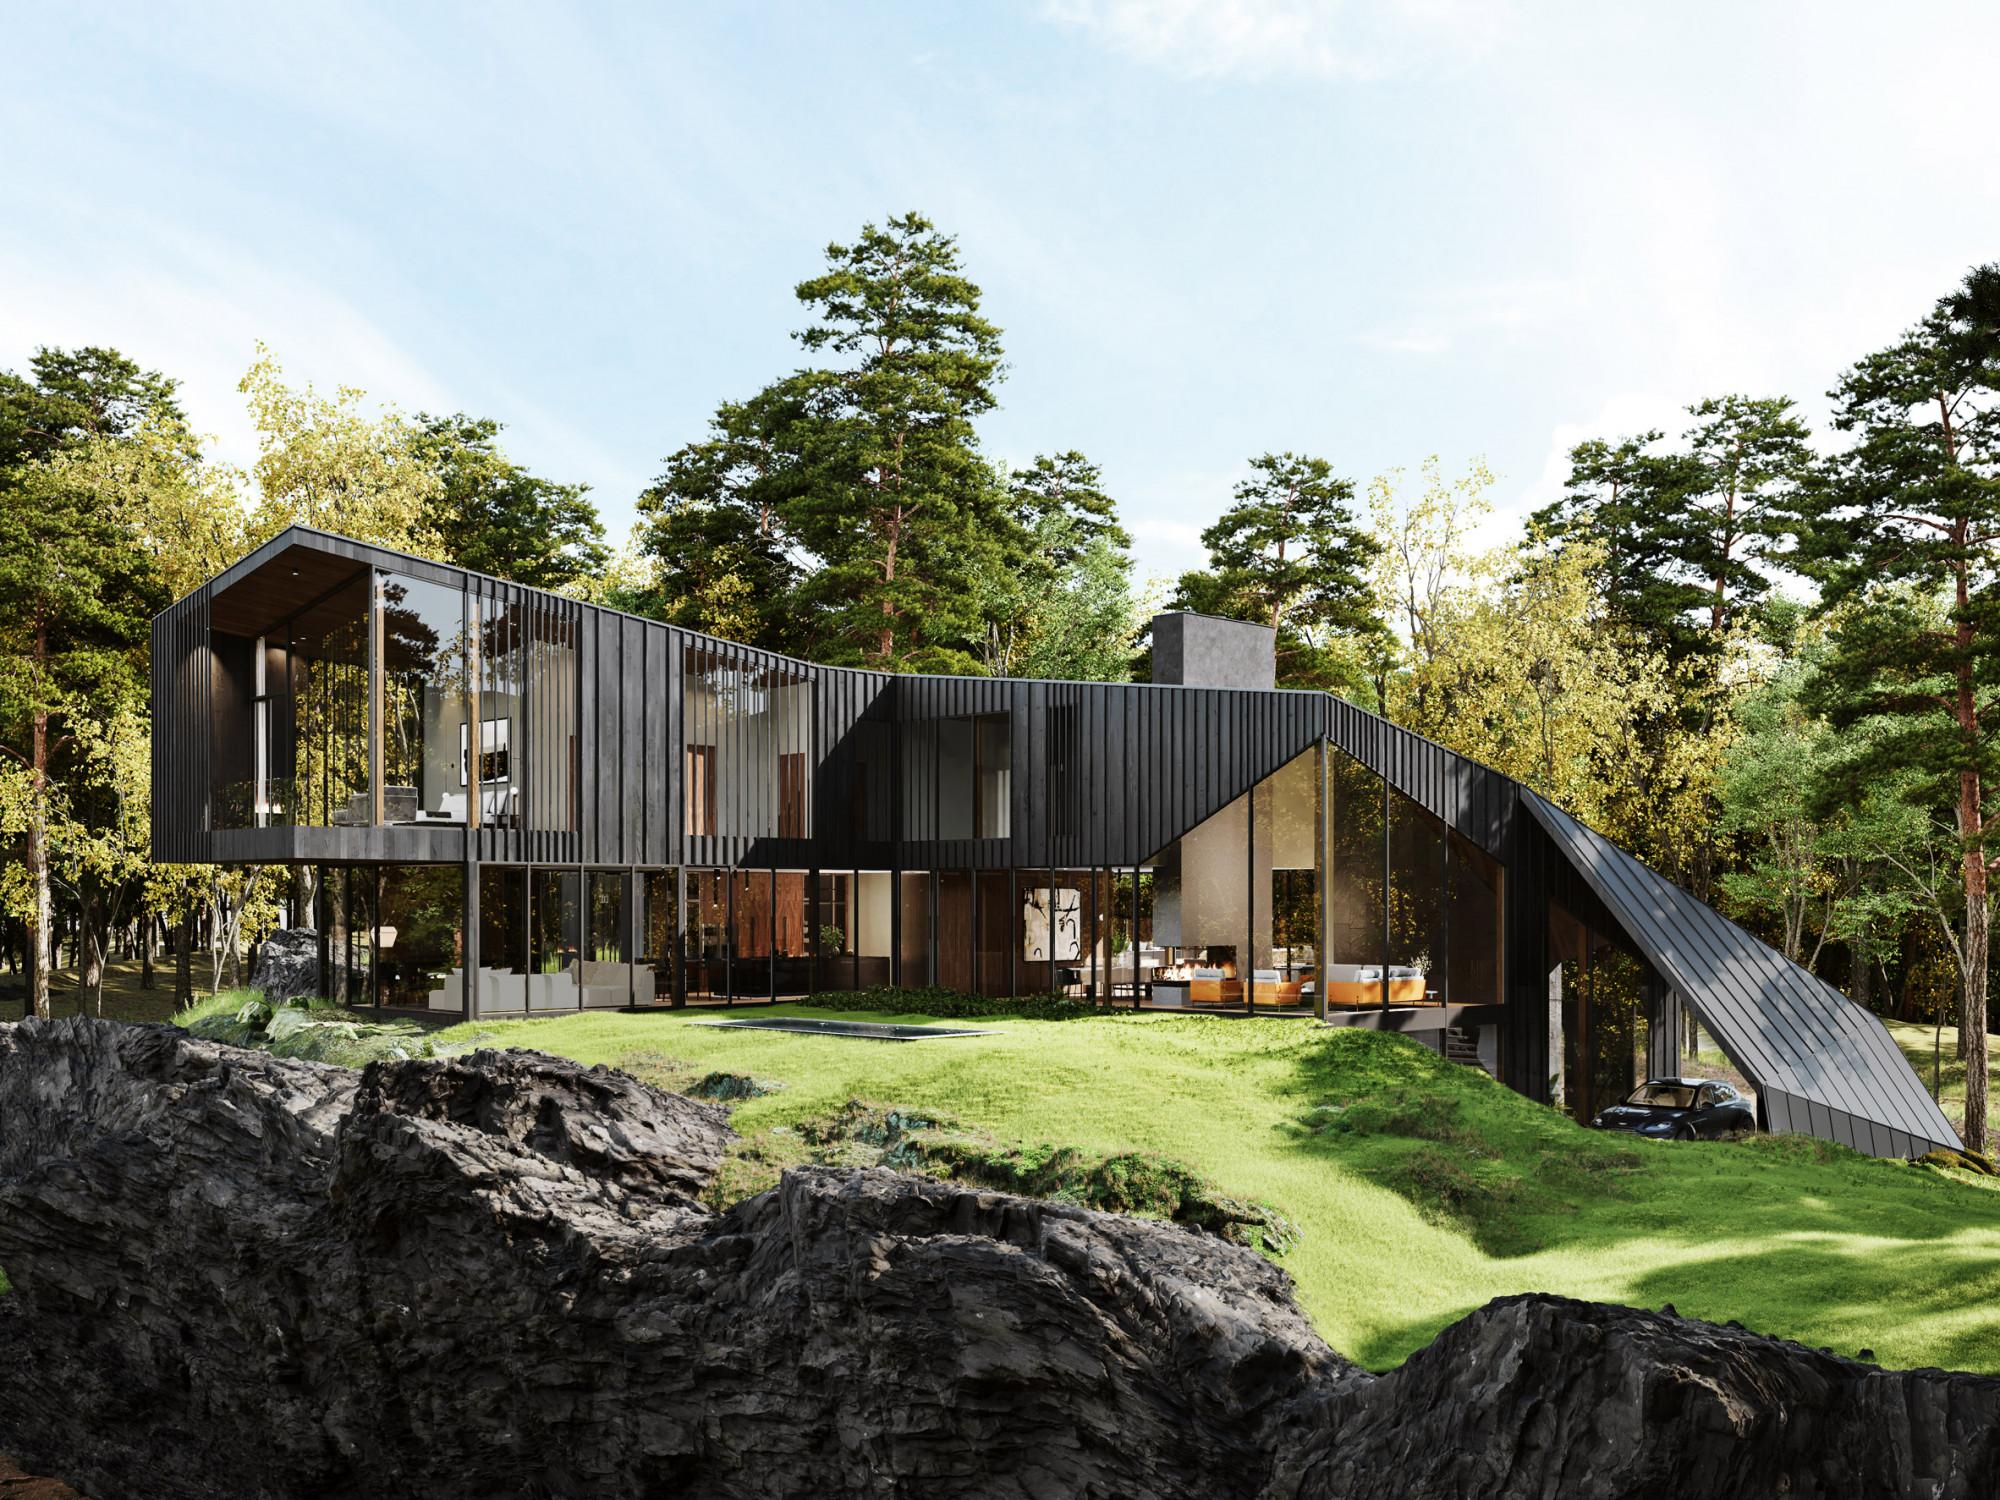 Sylvan-rock-house-architecture-hudson-valley-s3-02